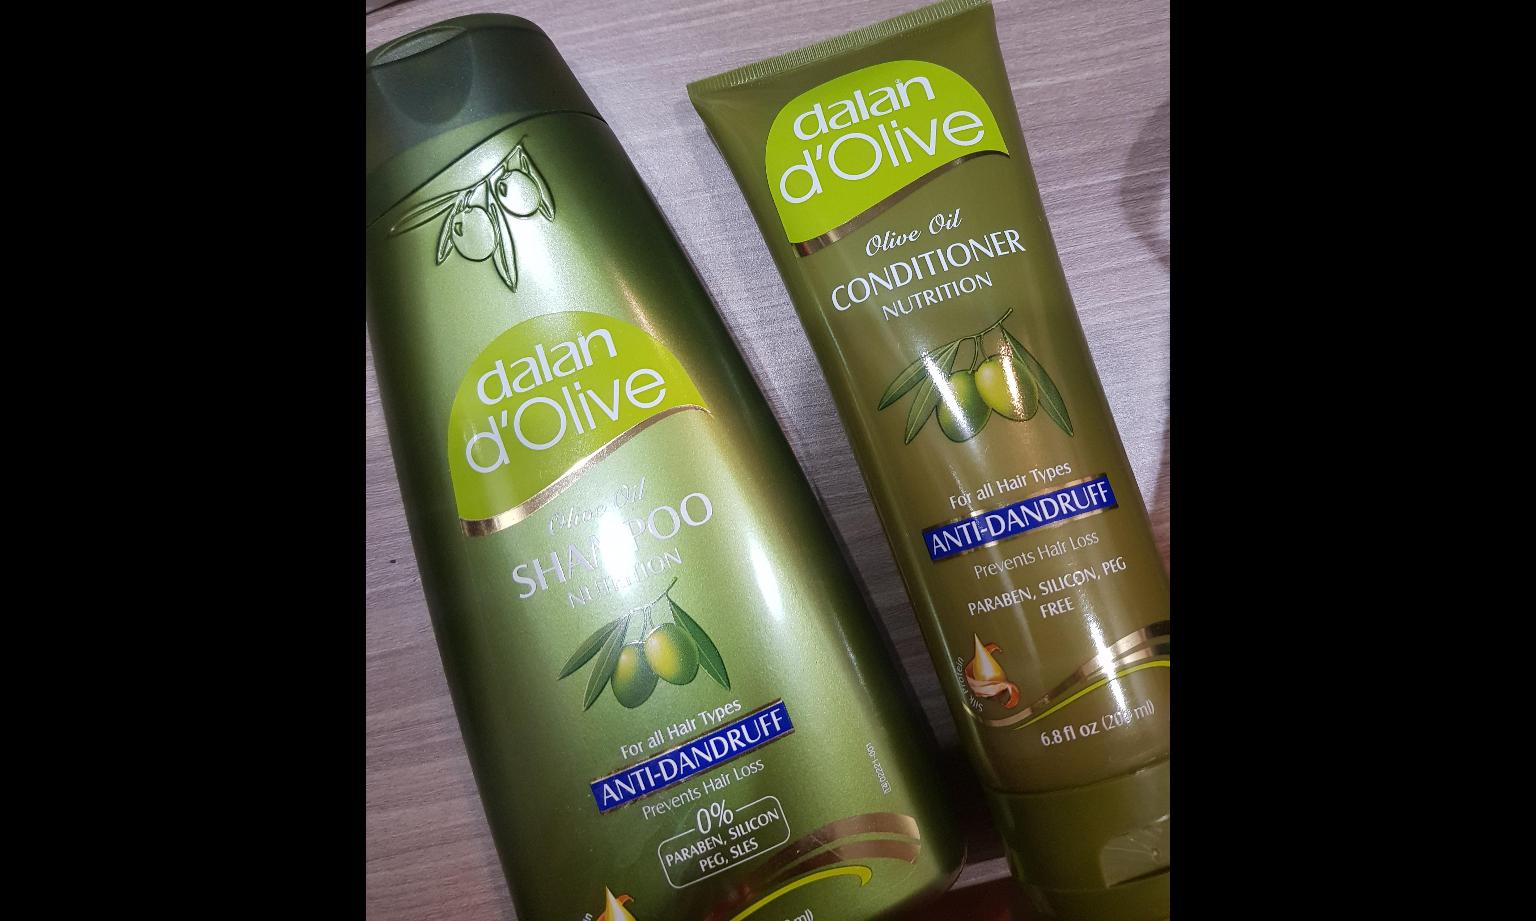 Dalan d'Olive Anti-Dandruff Shampoo